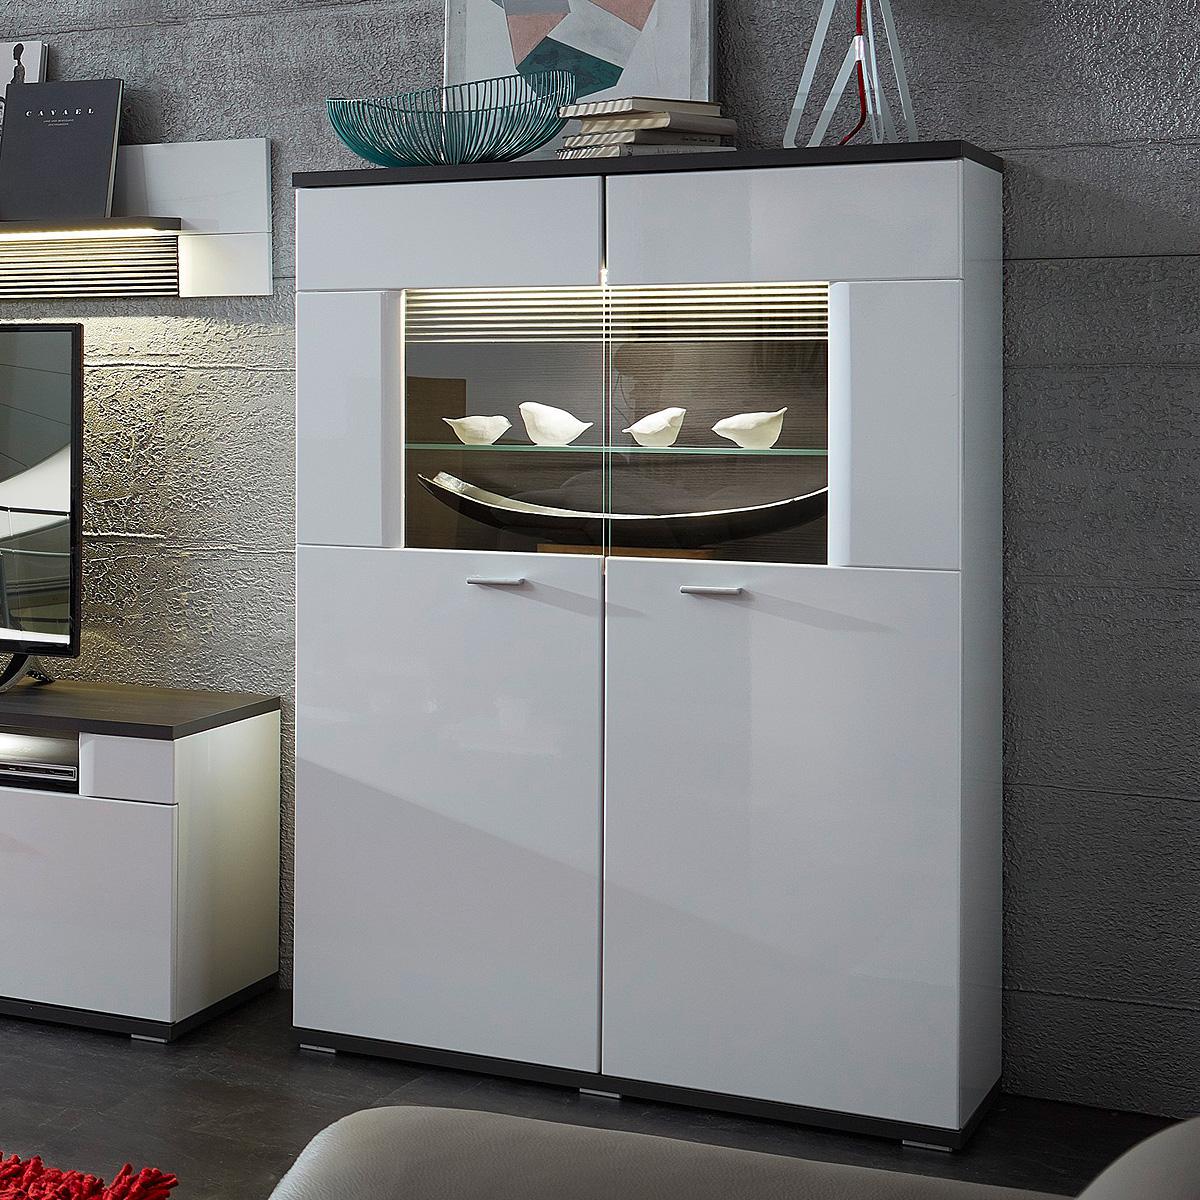 vitrine 2 madisons highboard schrank wei hochglanz matt. Black Bedroom Furniture Sets. Home Design Ideas